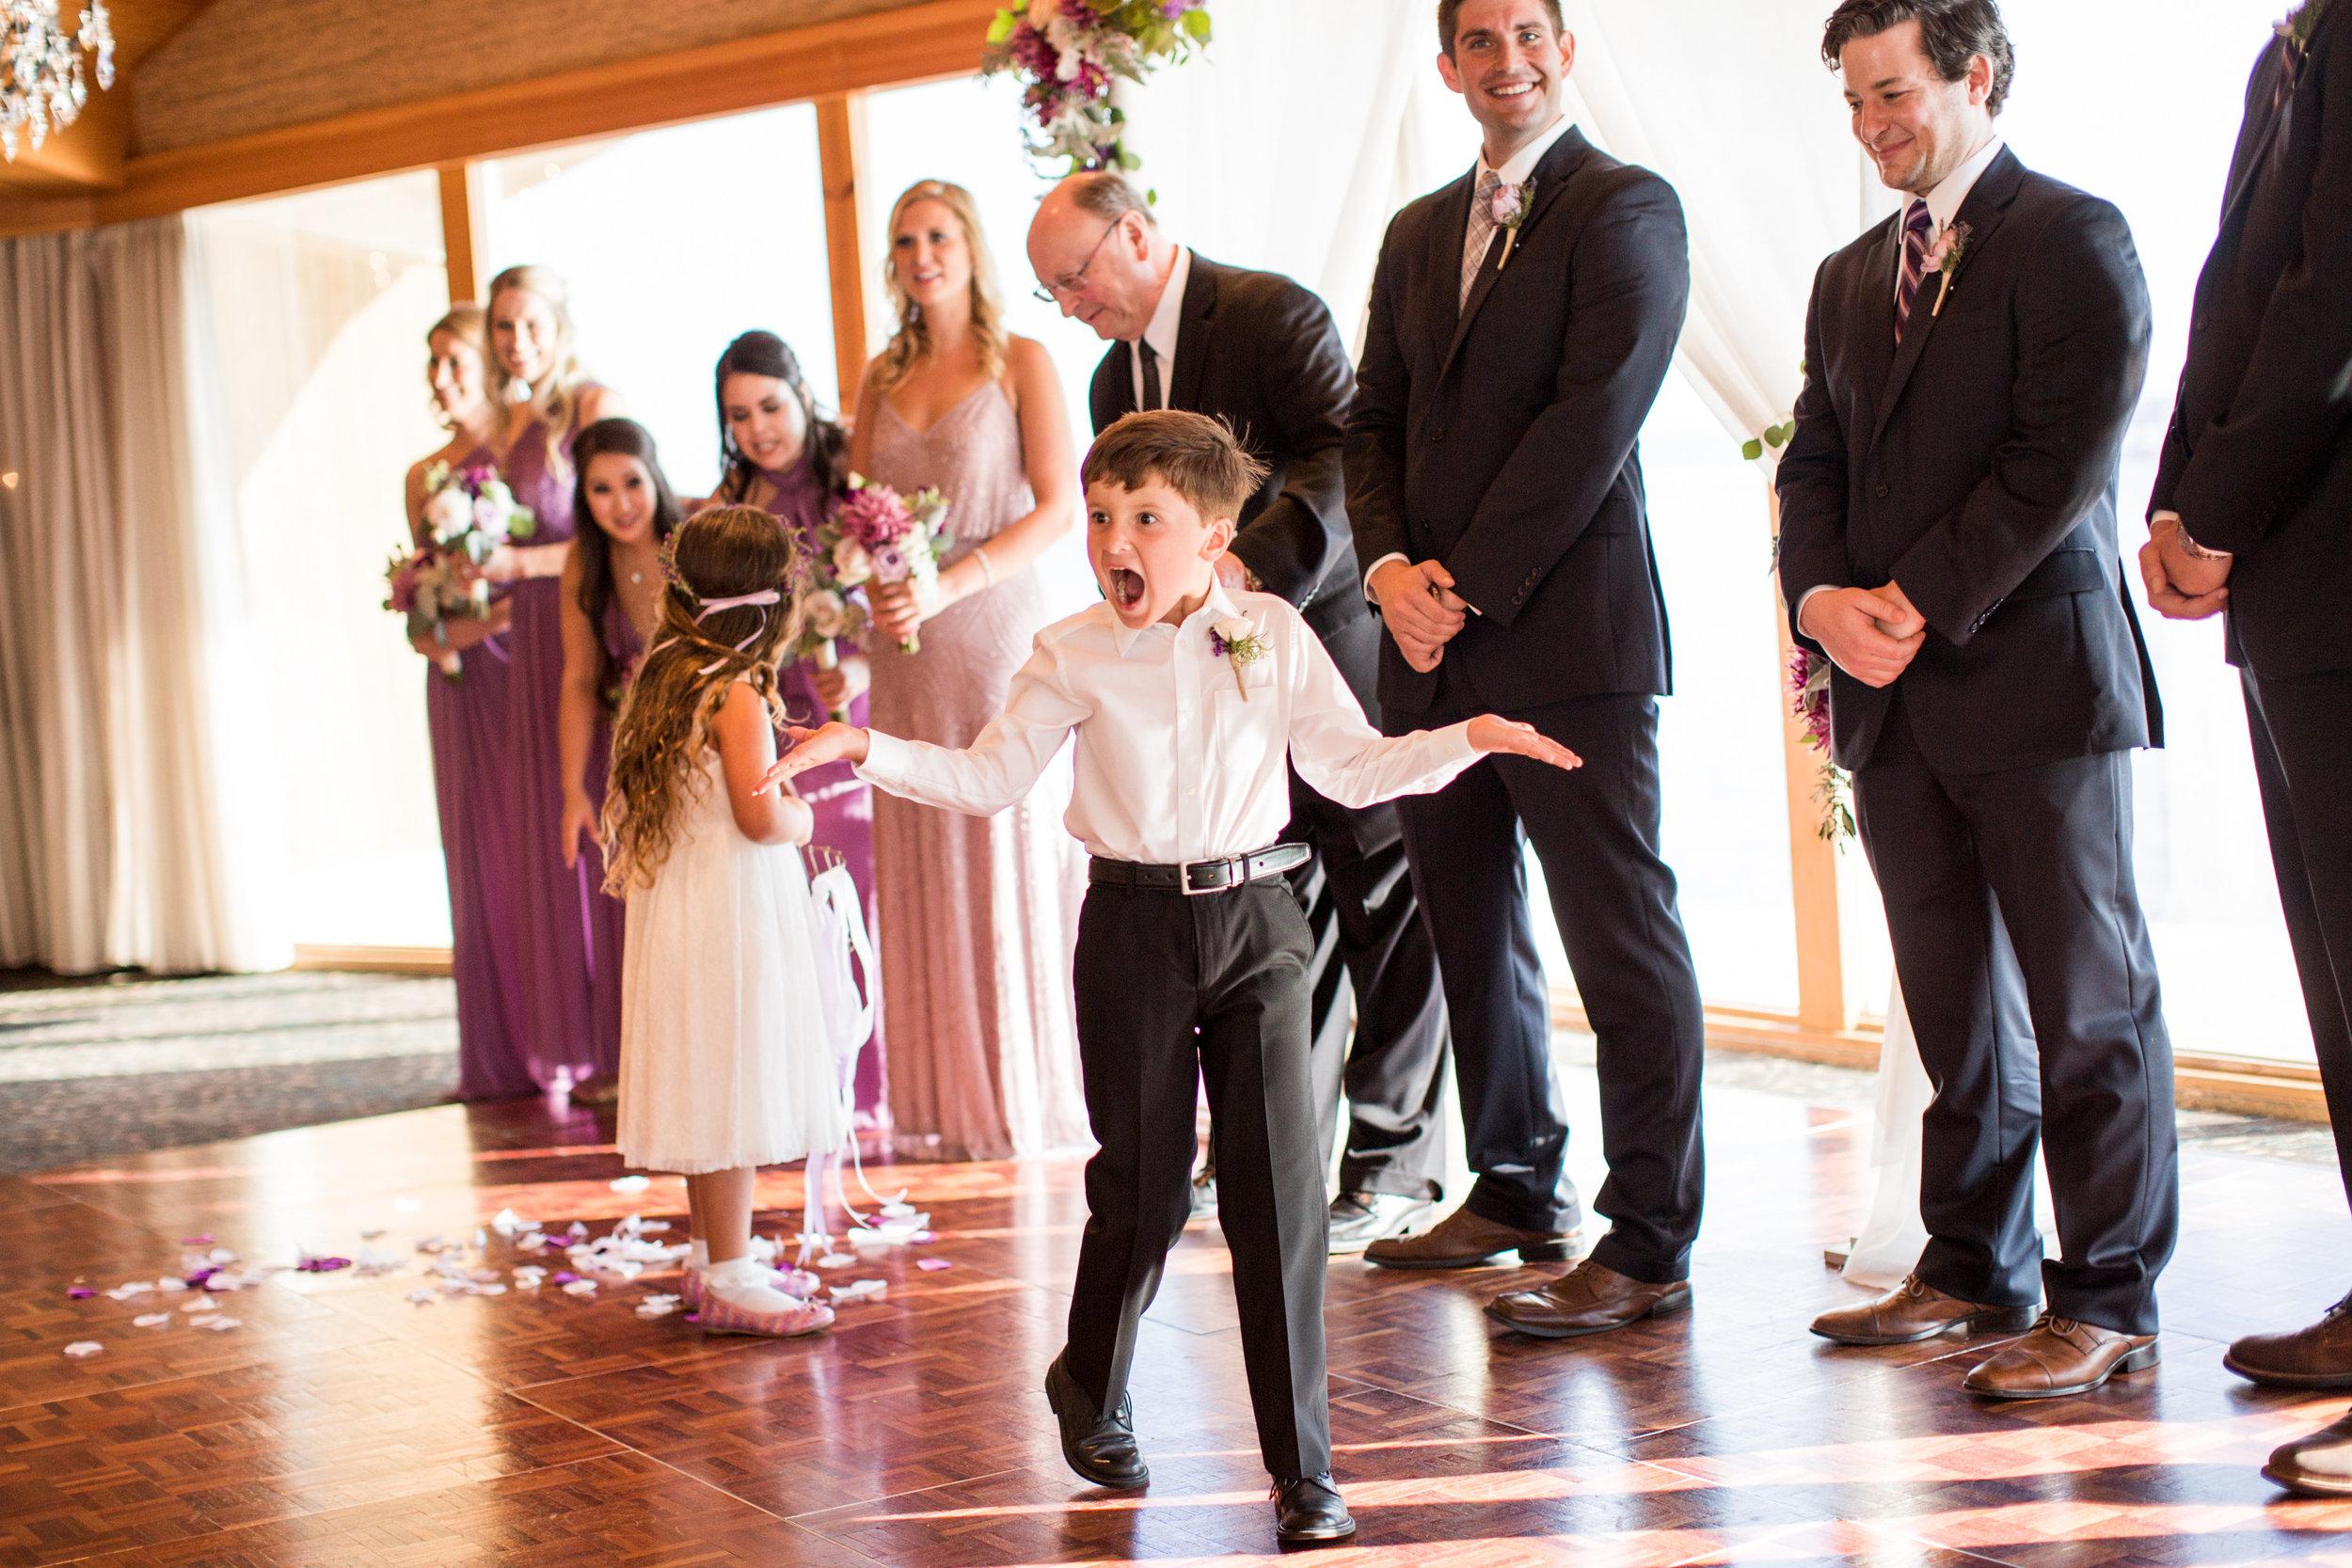 Seattle Wedding Planner, Wedding Wise | Ciccarelli Photography | Edgewater Hotel Wedding | Purple and navy blue wedding